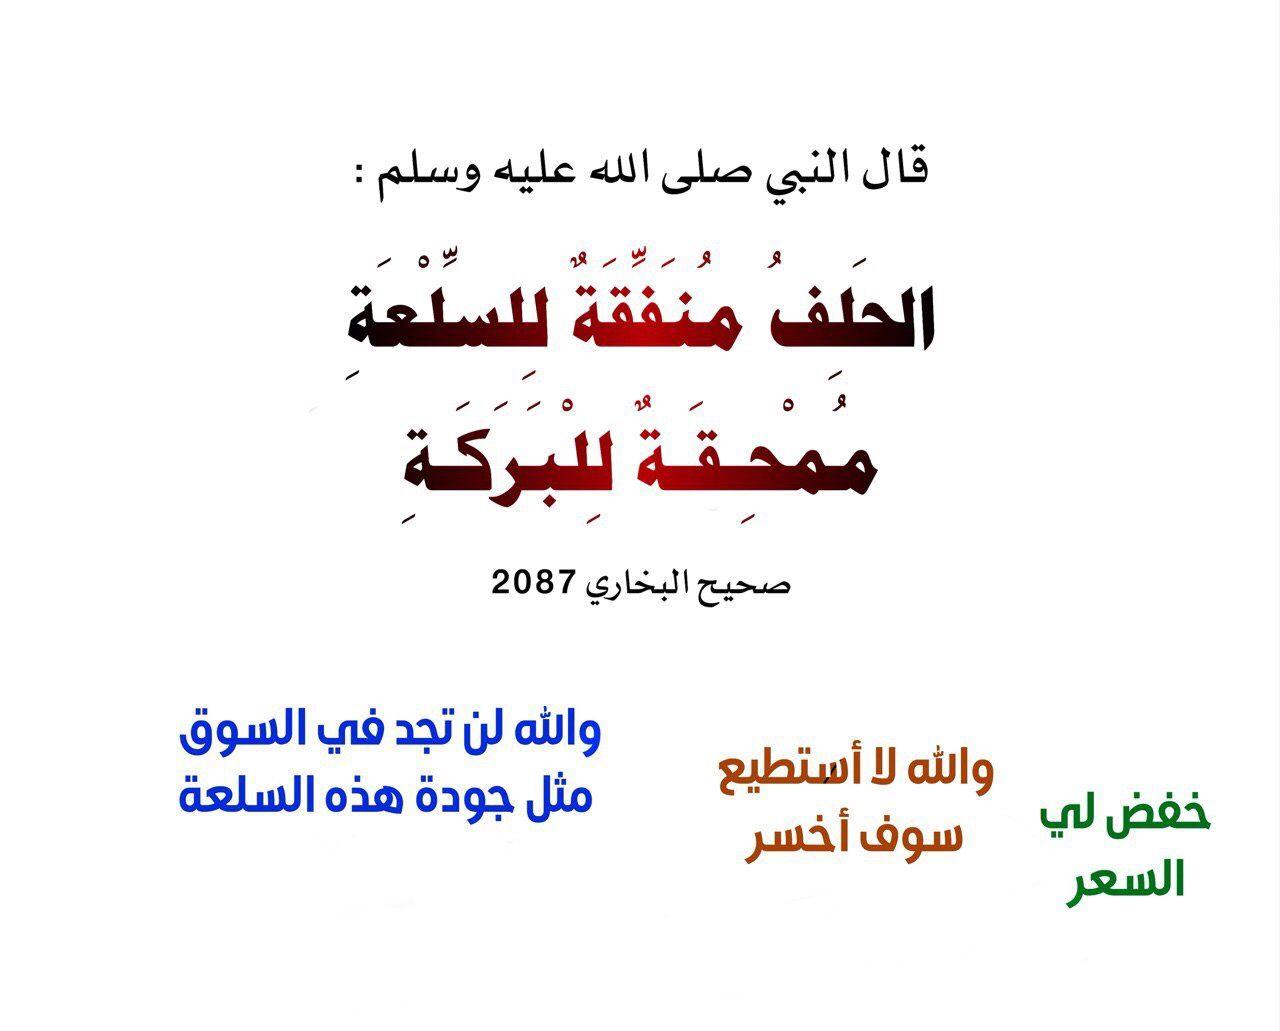 Pin By نشر الخير On أحاديث سيدنا محمد صلى الله عليه وسلم Math Calligraphy Oio